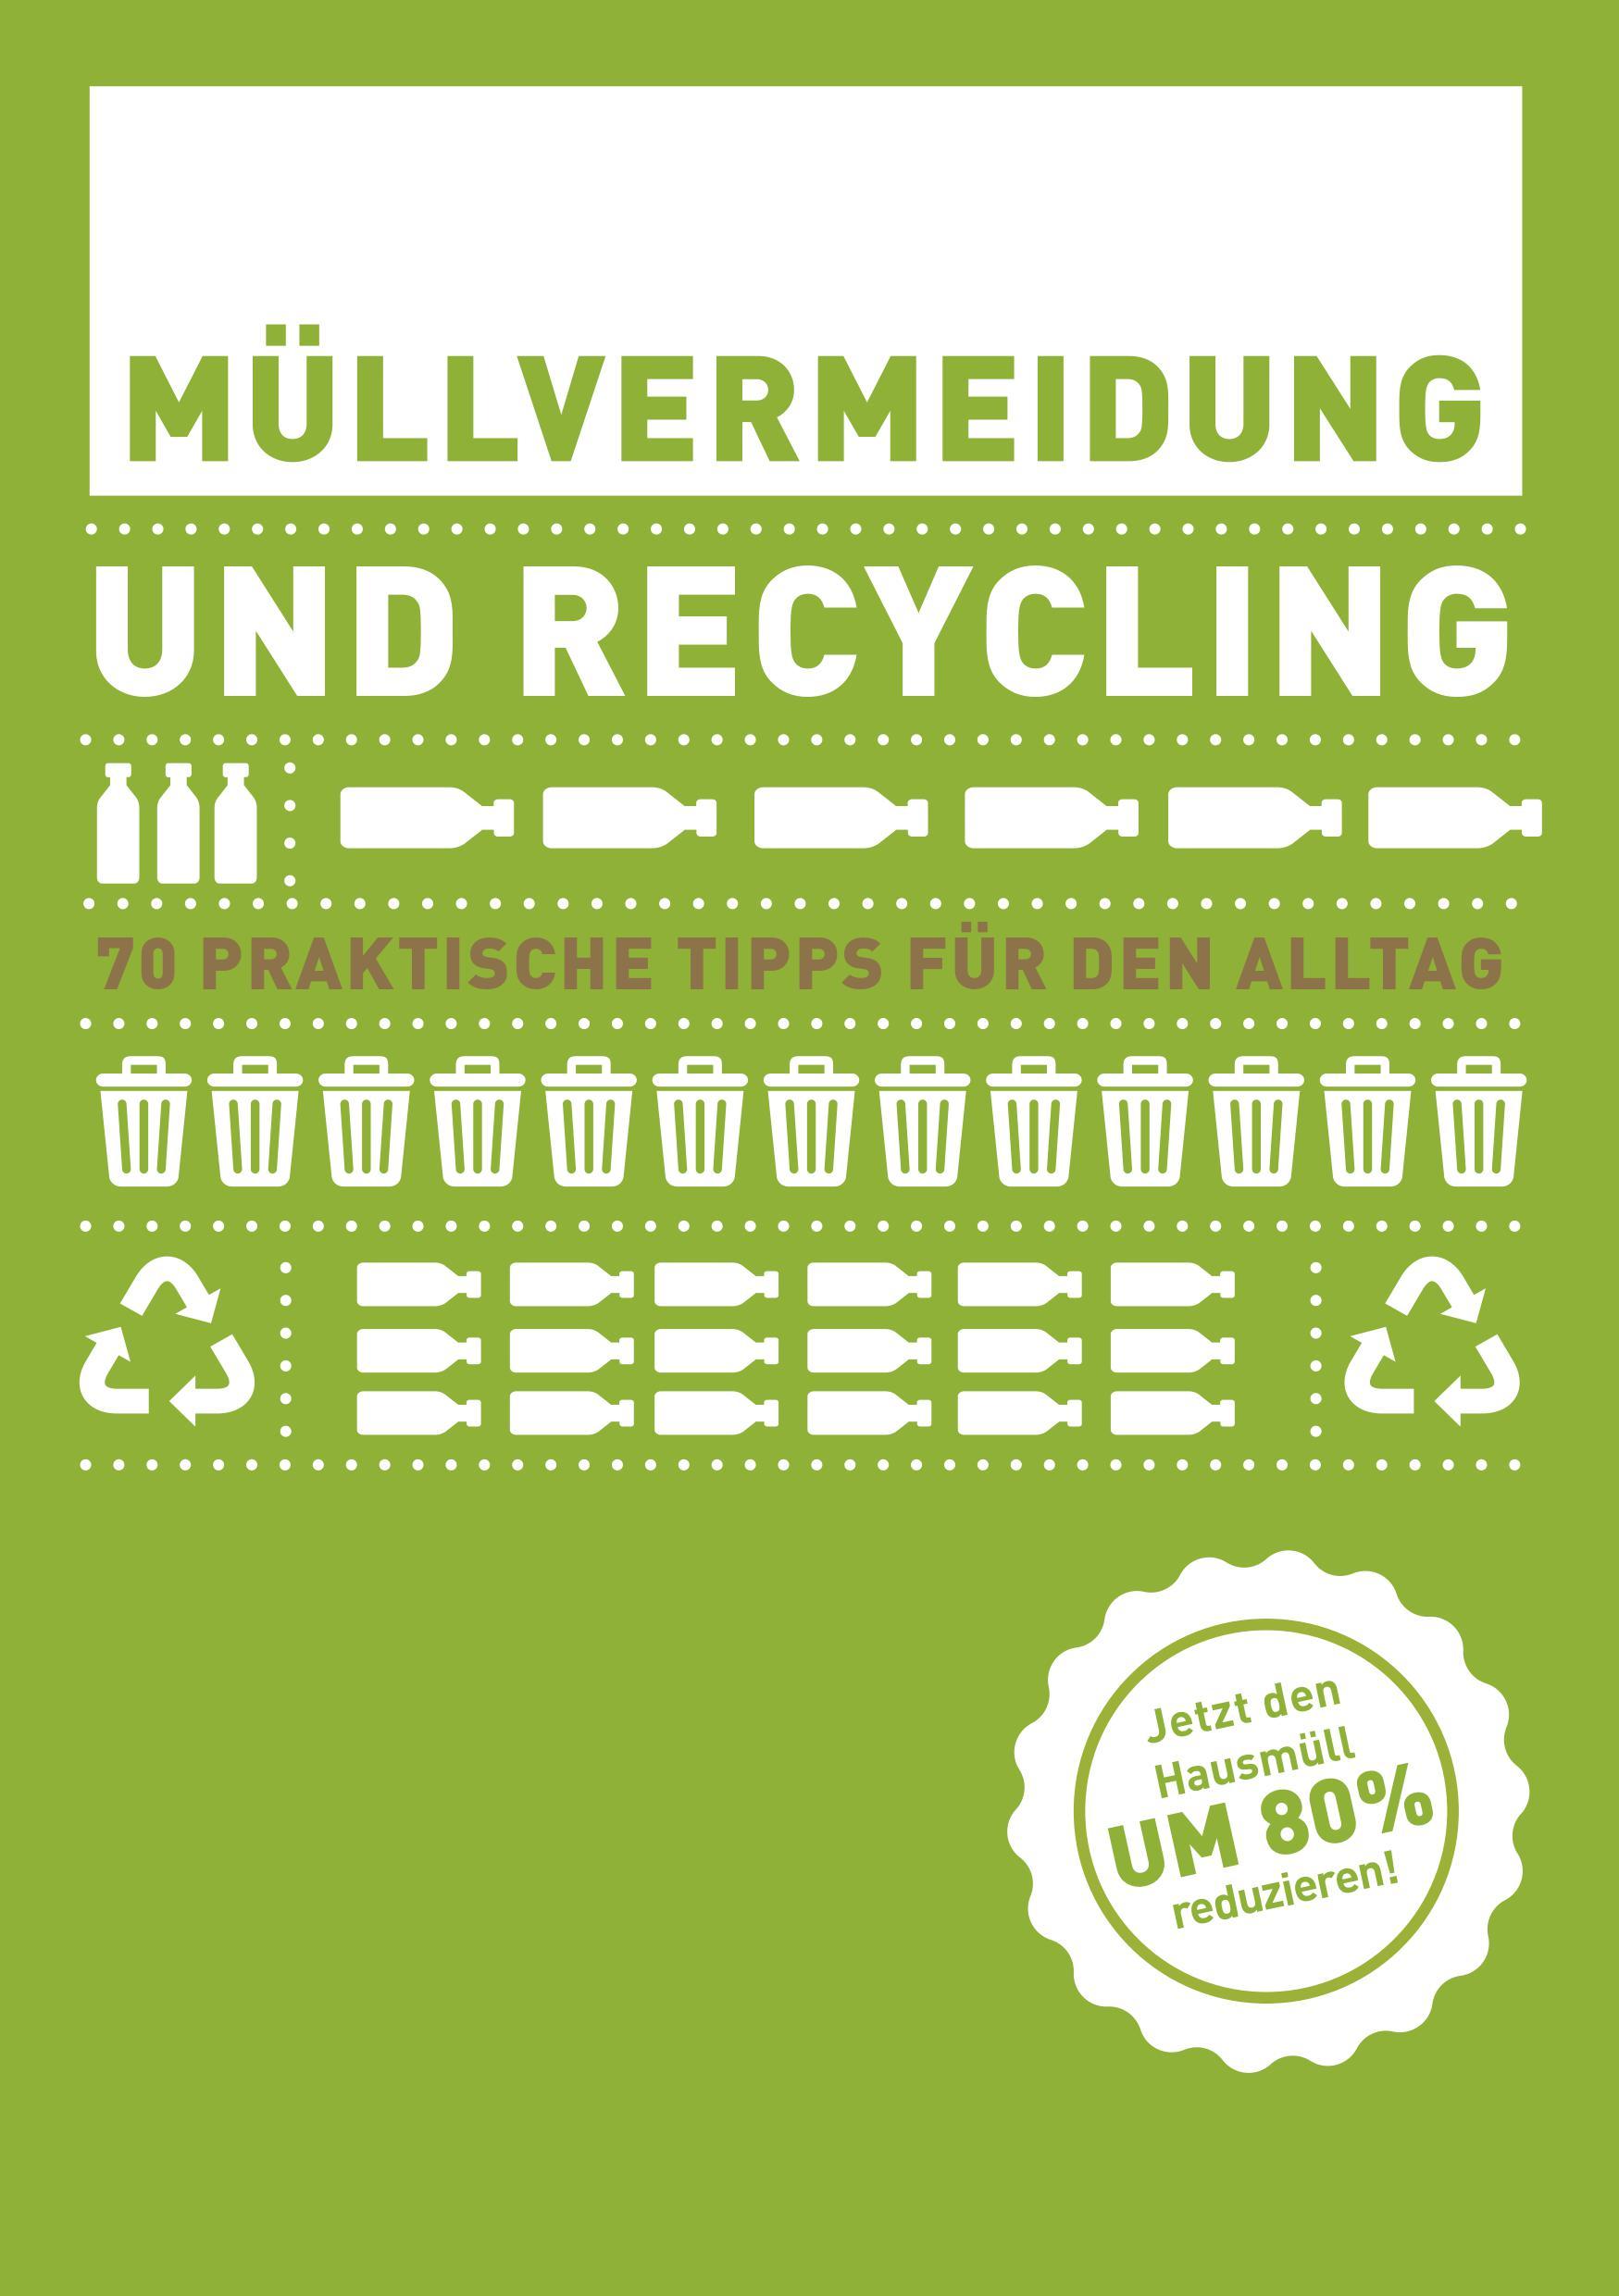 Ebook Müllvermeidung und Recycling. Quelle: http://snm-hnee.de